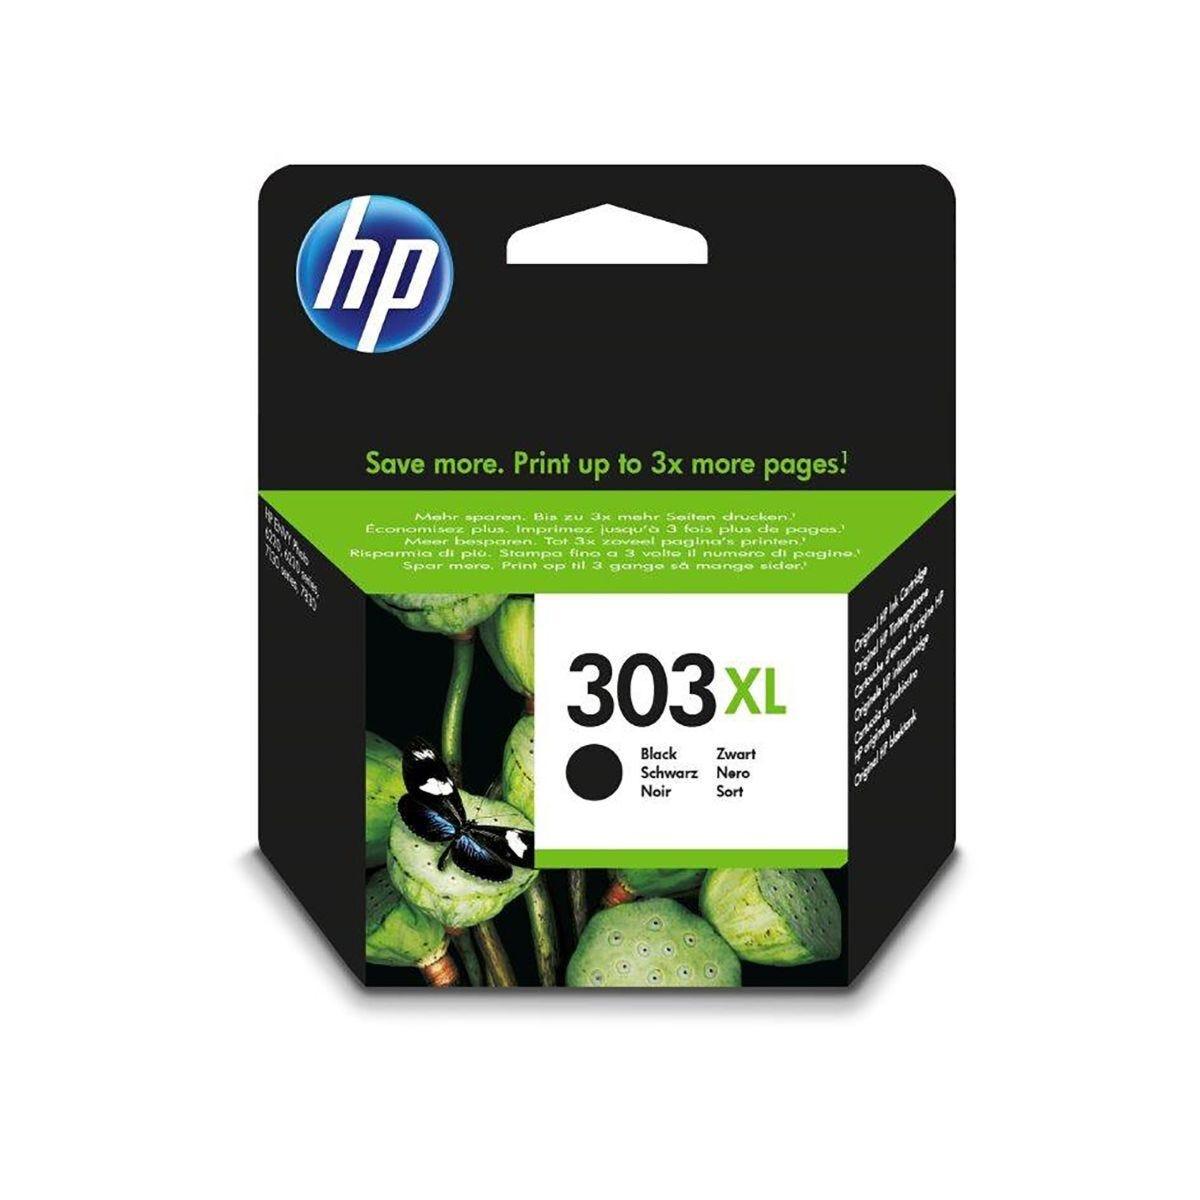 HP Ink Cartridge 303XL Black Inkjet